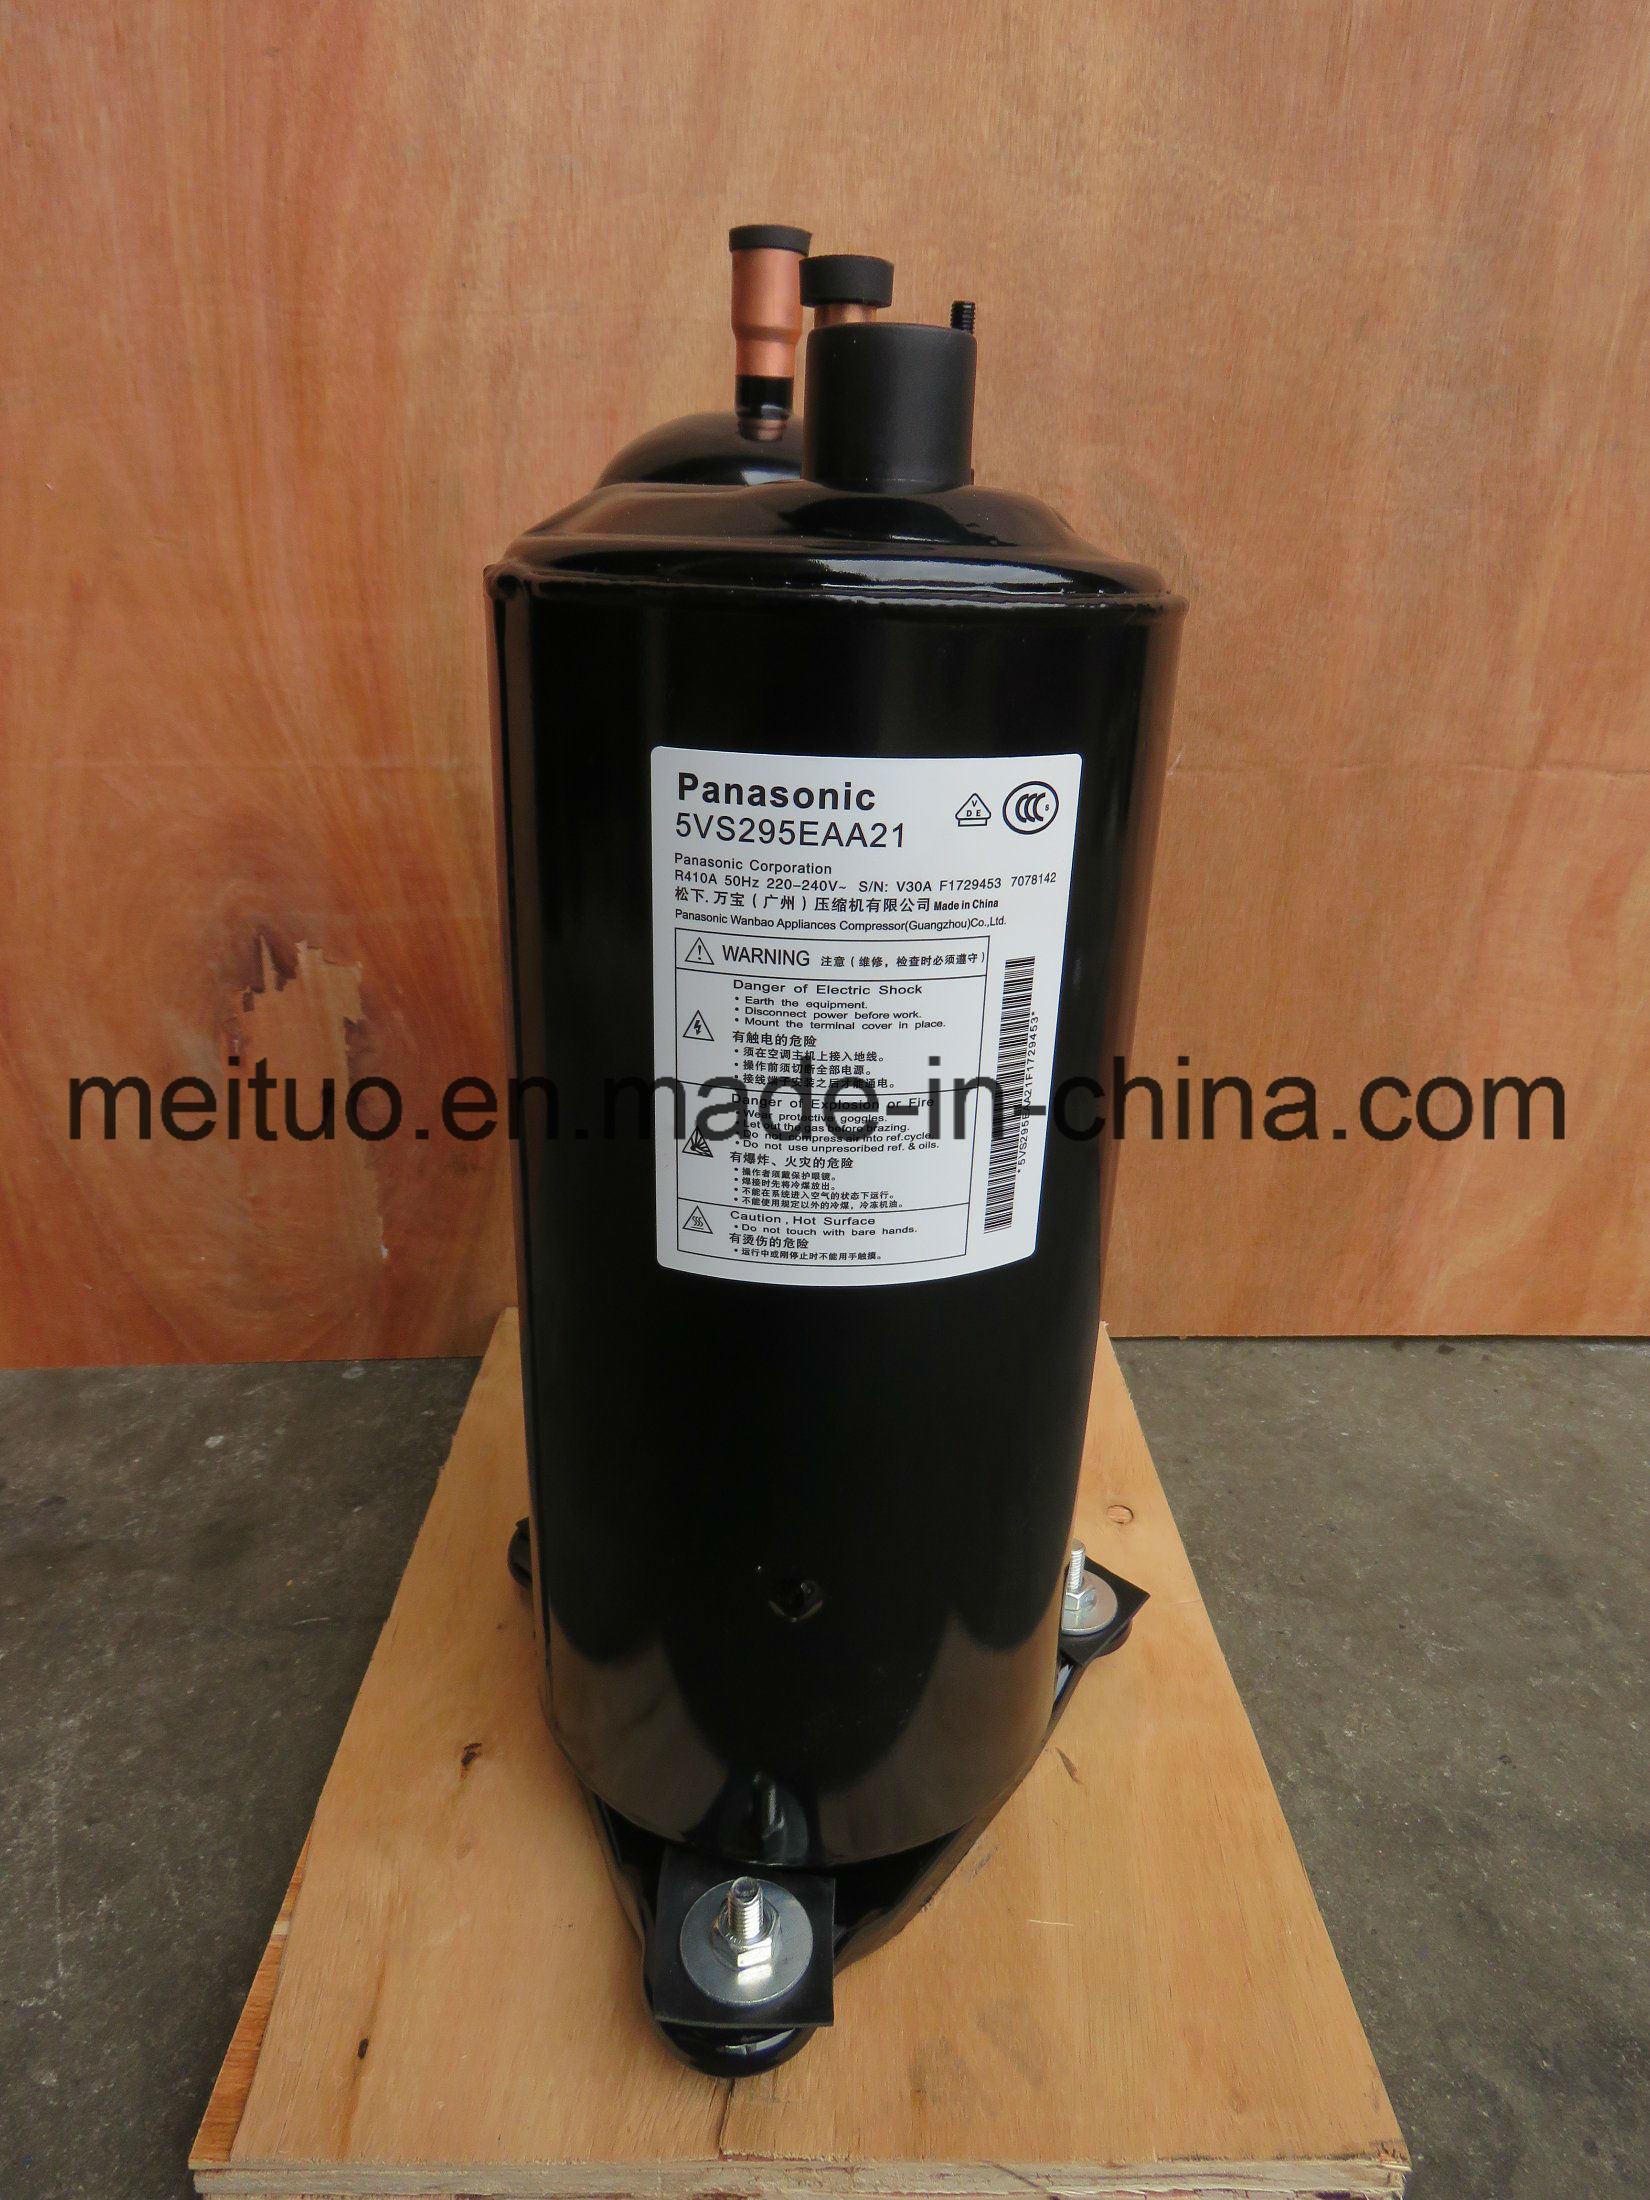 [Hot Item] 220V 50Hz Panasonic Matsushita Air Conditioner Compressor  5vs295eaa21